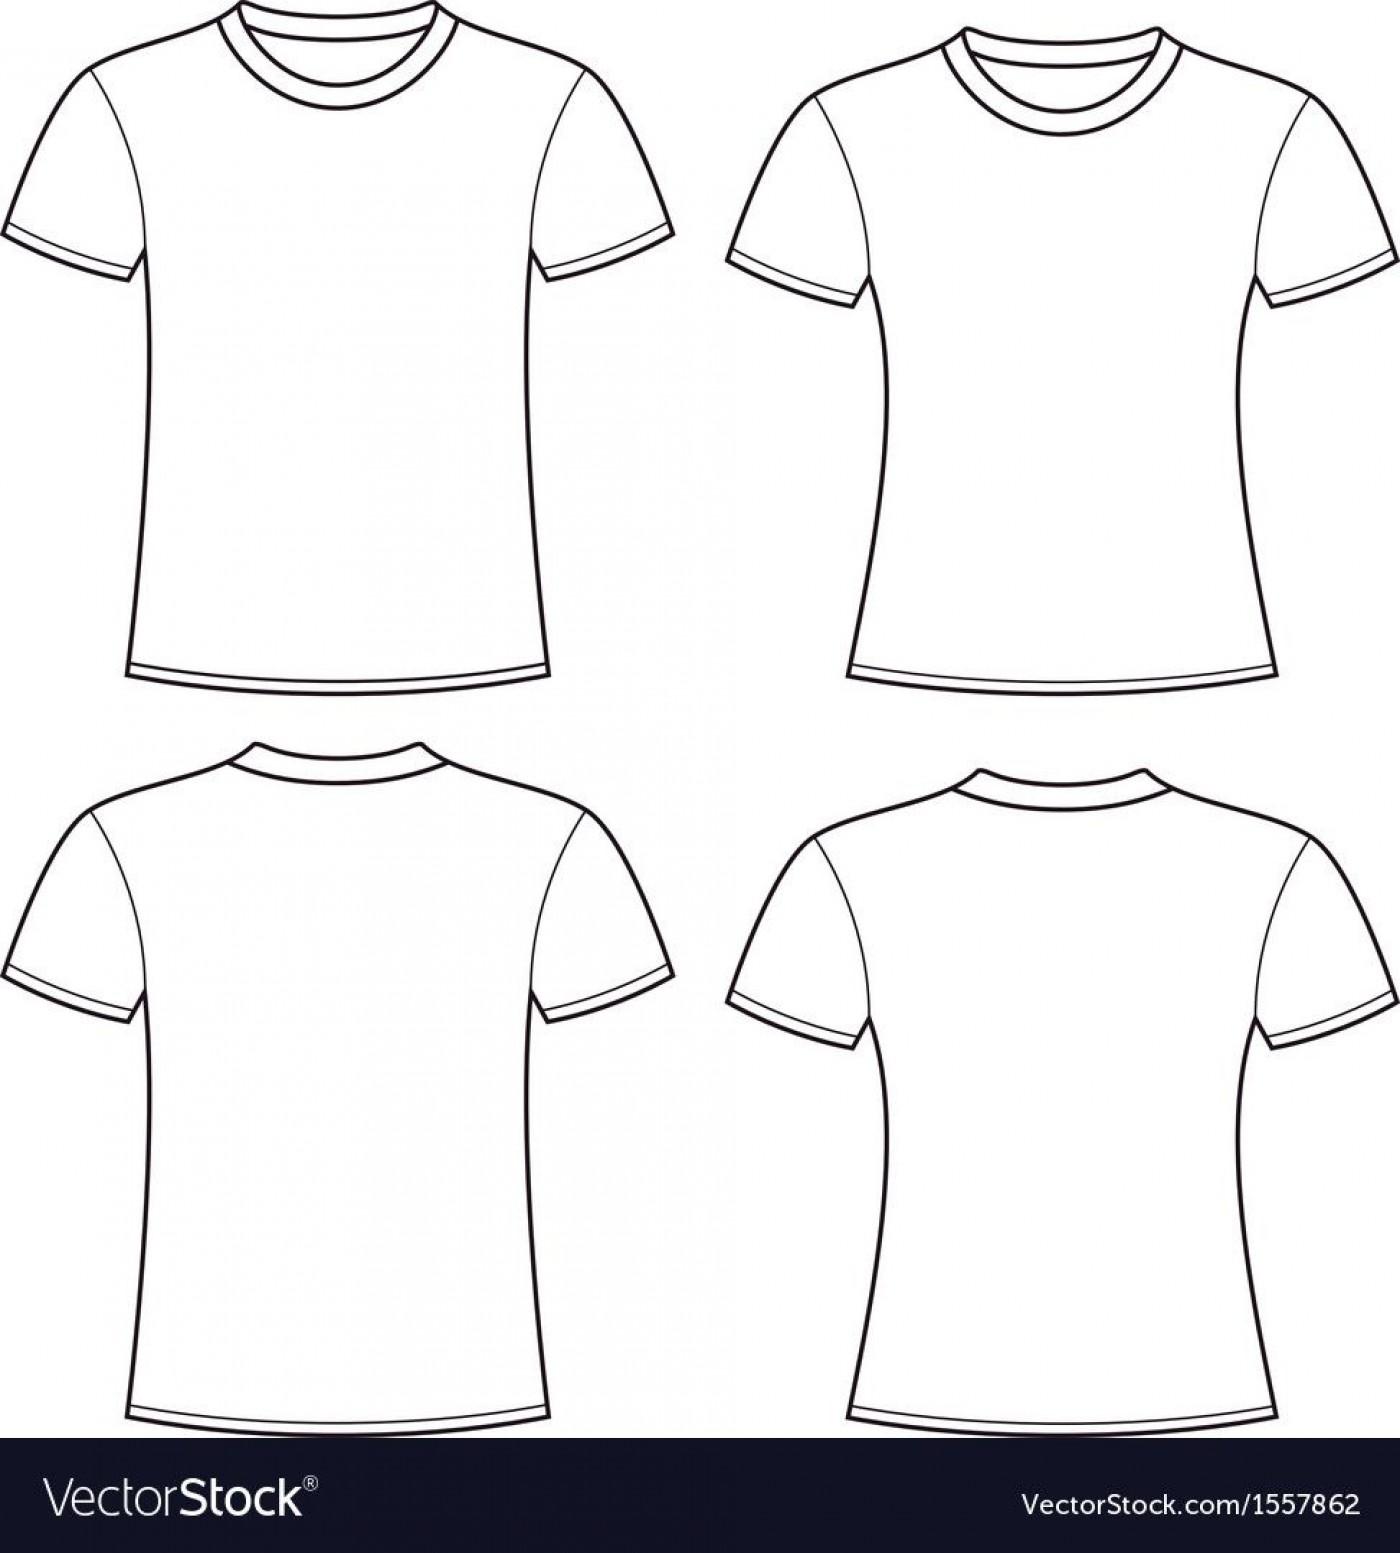 004 Impressive T Shirt Template Free High Definition  Polo T-shirt Illustrator Download Website Editable Design1400